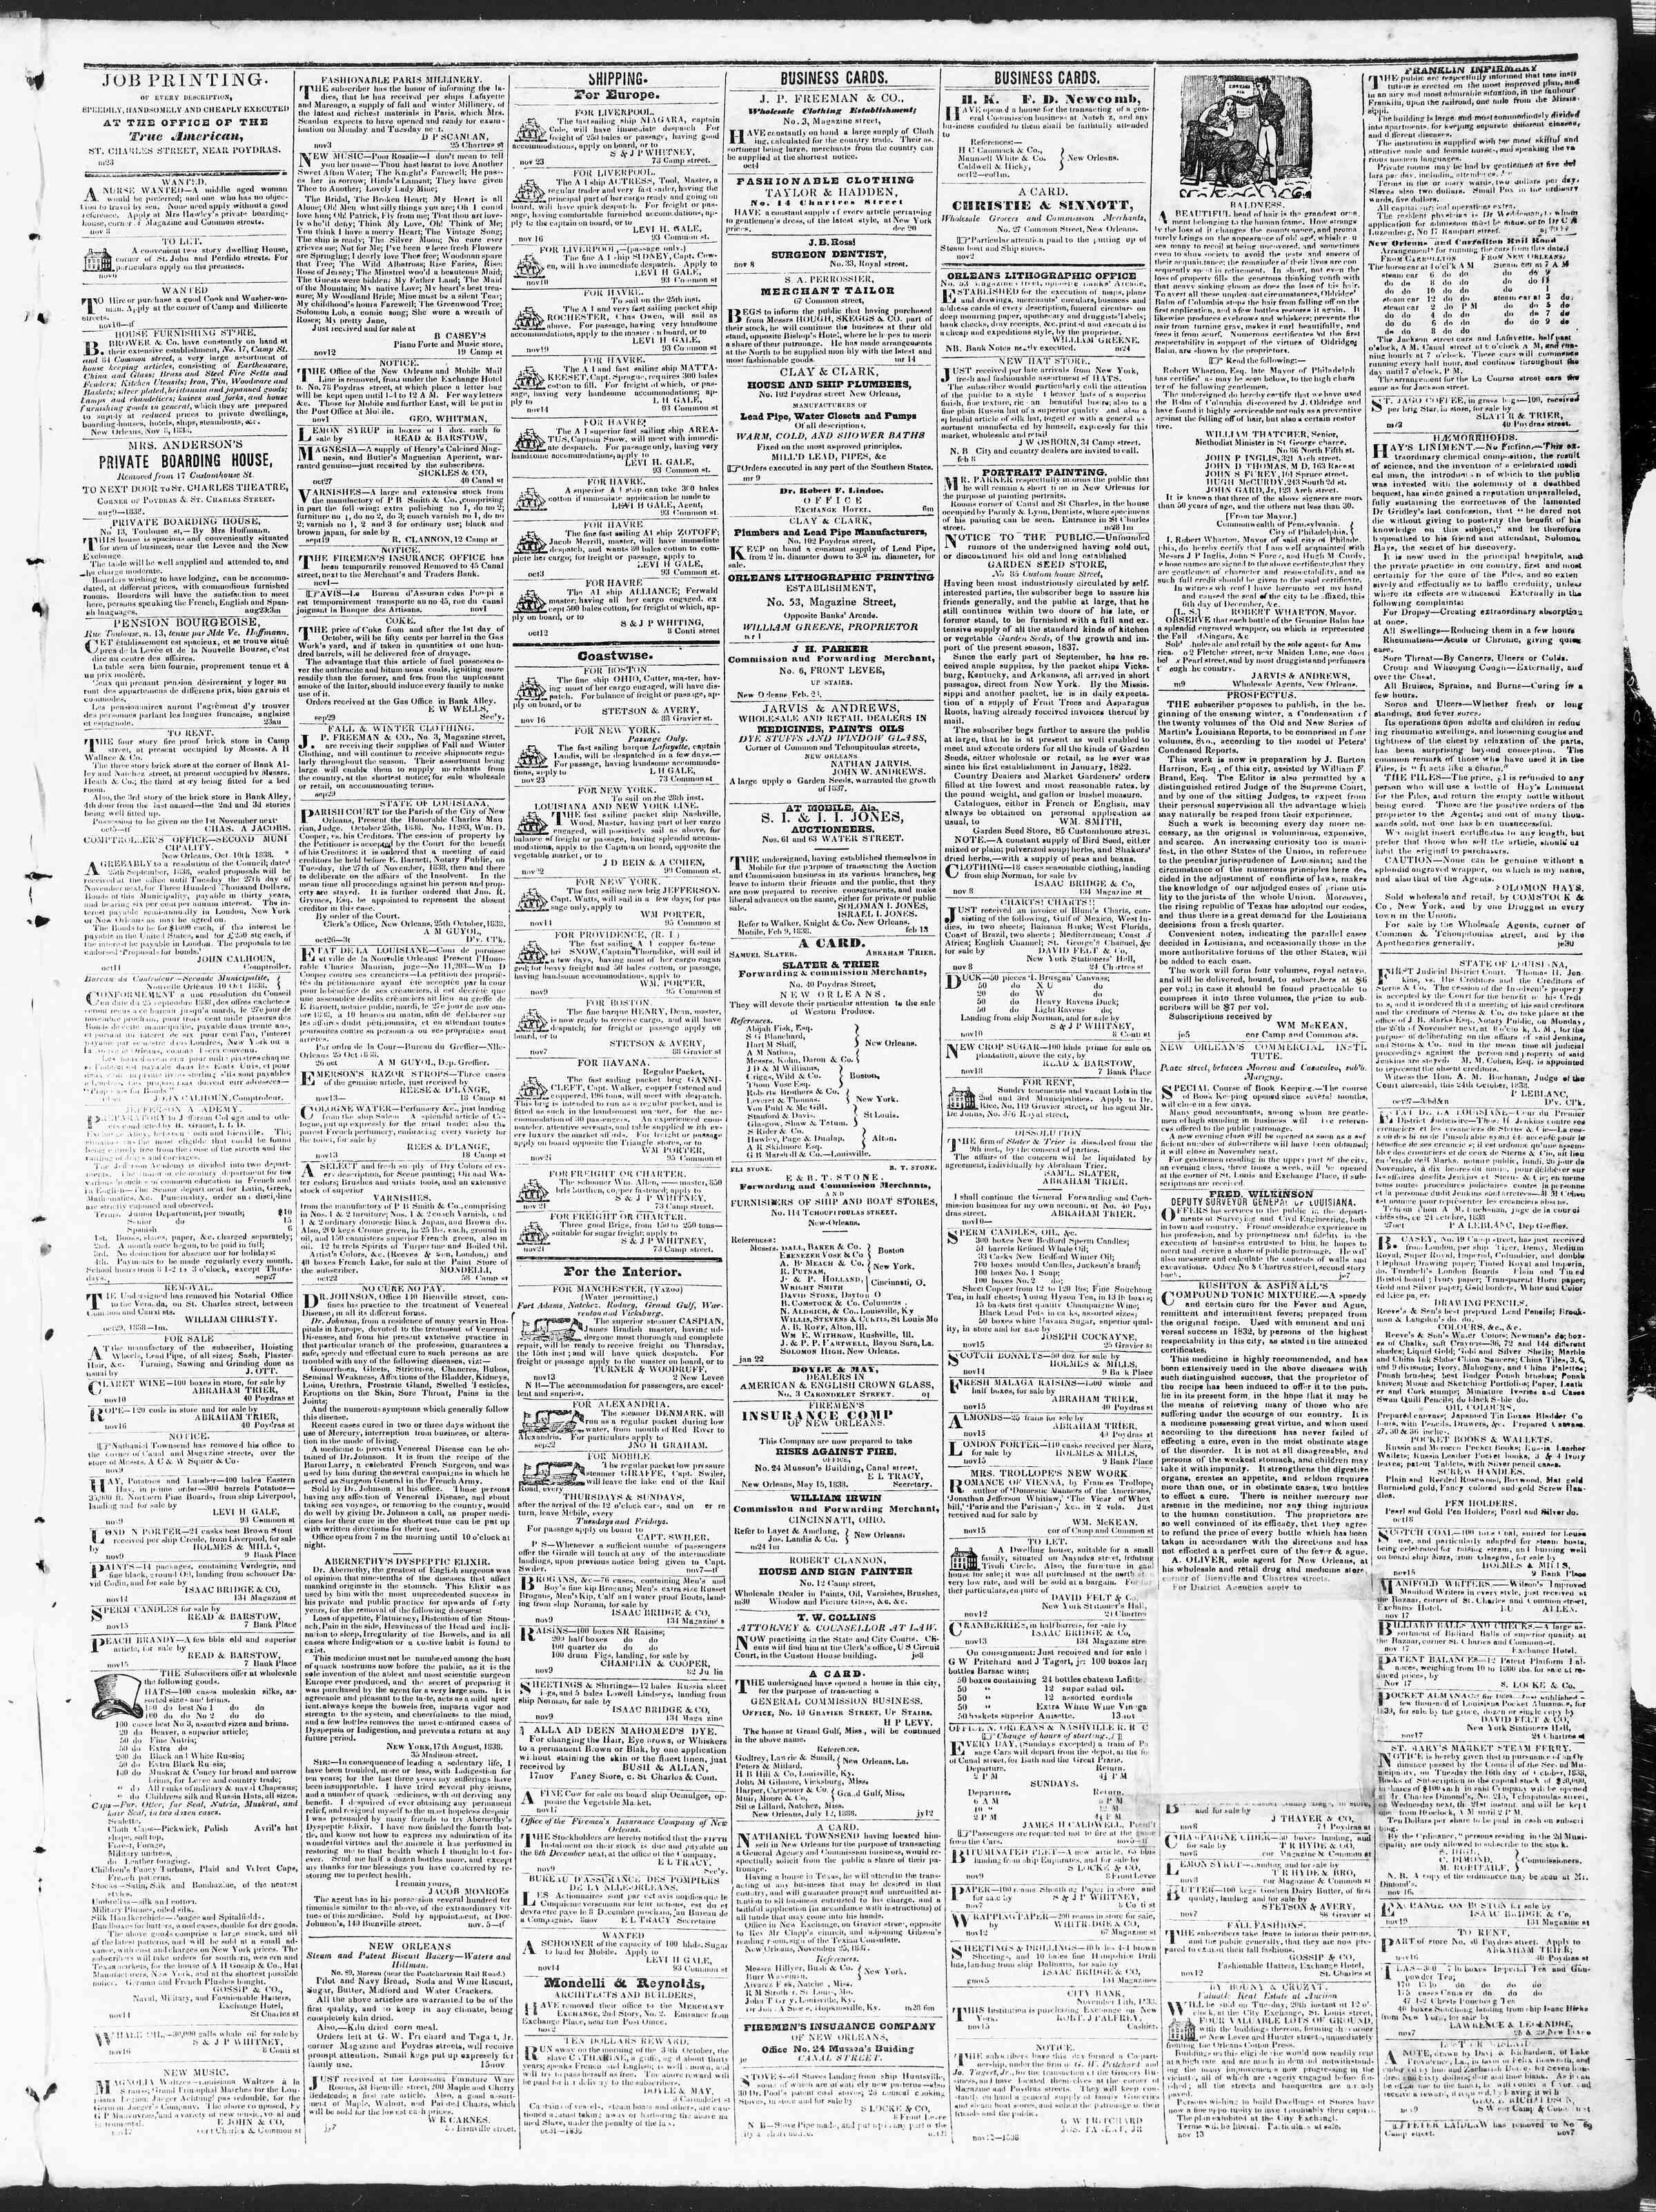 November 23, 1838 Tarihli True American Gazetesi Sayfa 3